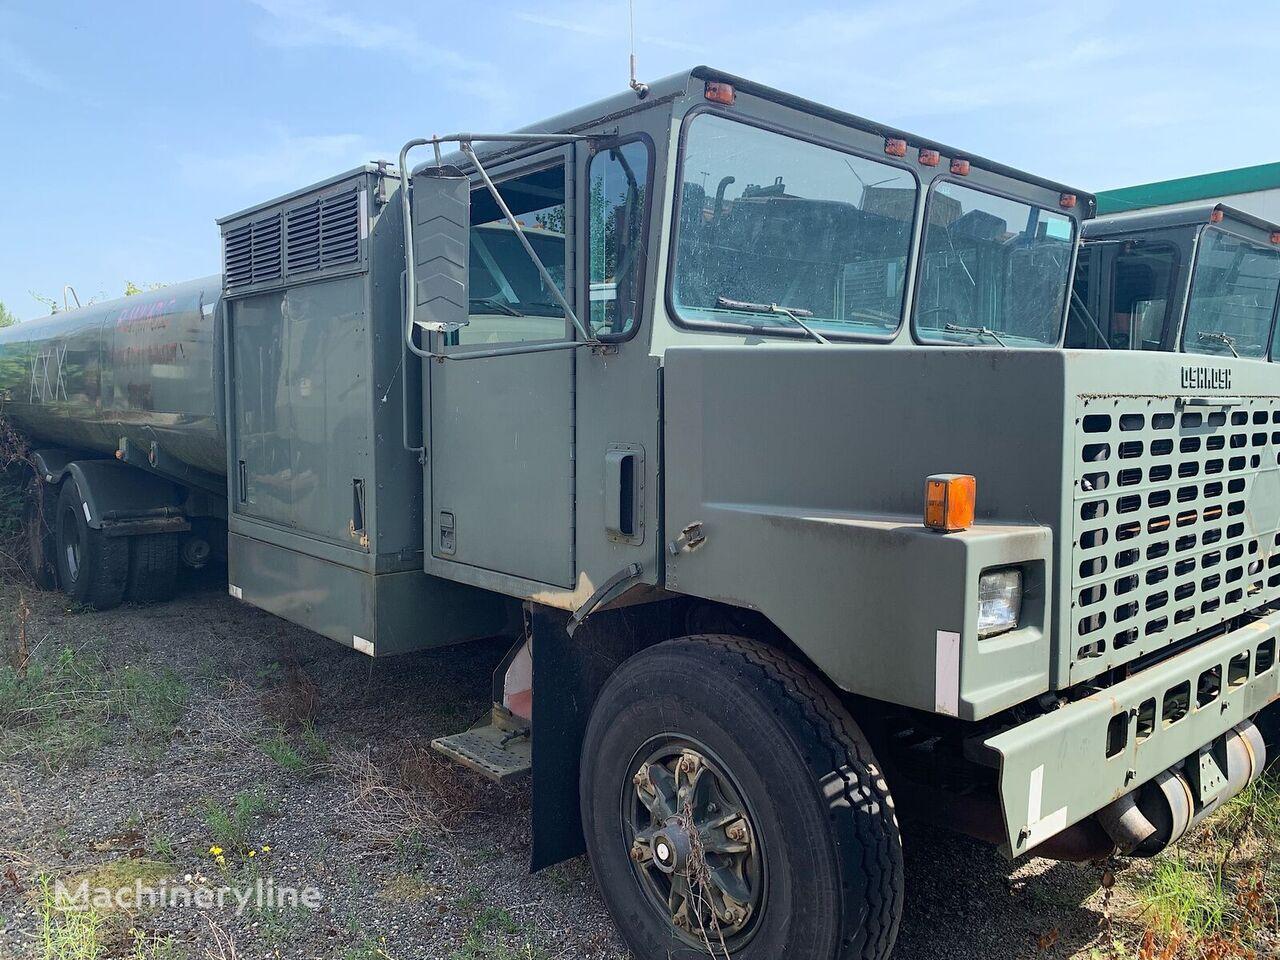 Oskosh Tank truck. Airport Tanker 3 meter wide other airport equipment